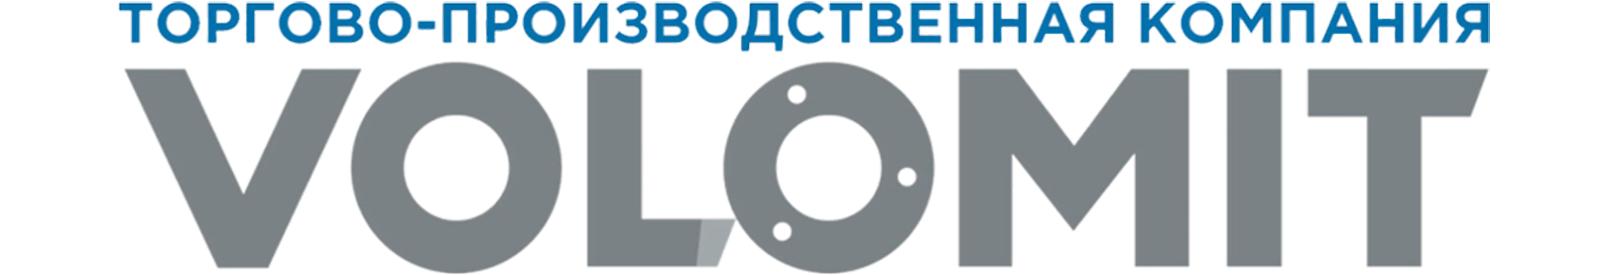 Инфо.Сайт 🌍 БАРНАУЛ : Новости и Веб-сайты Барнаула